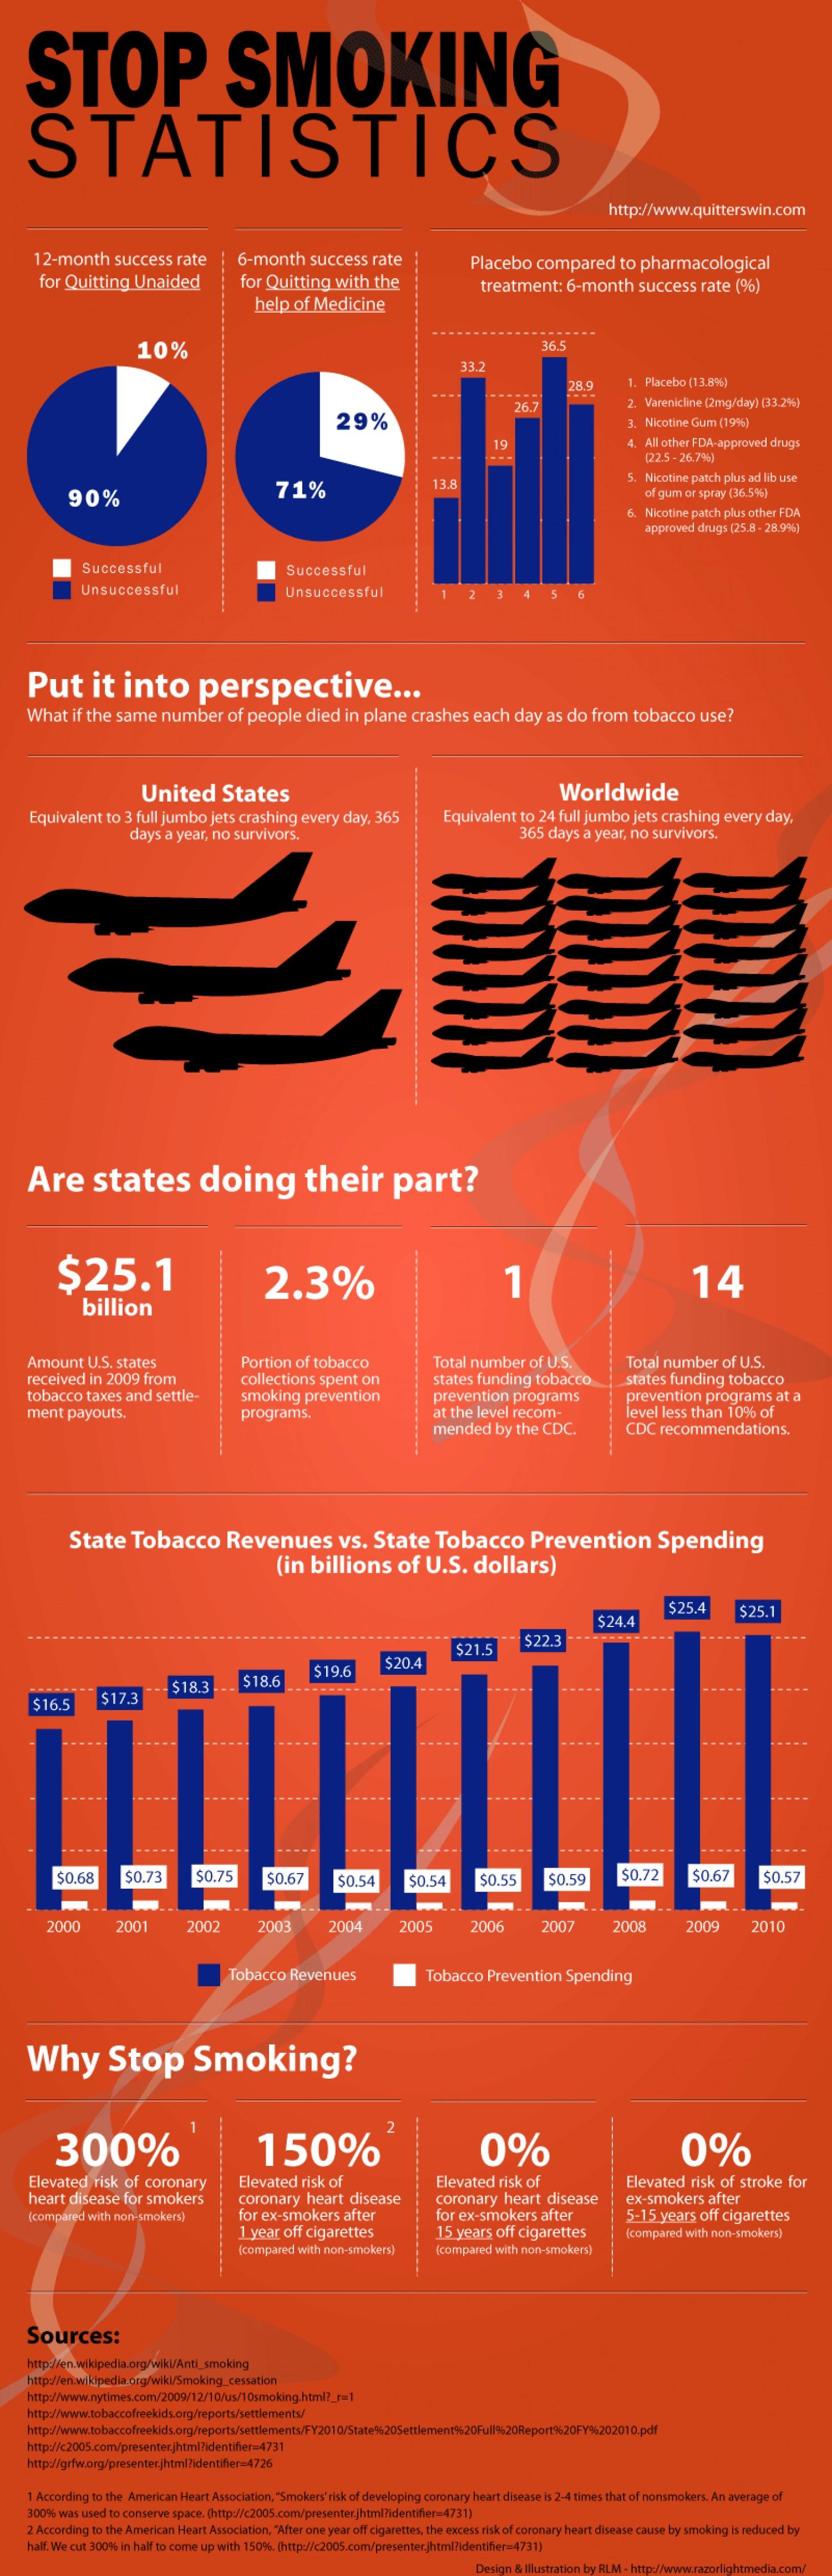 4. Stop Smoking Statistics